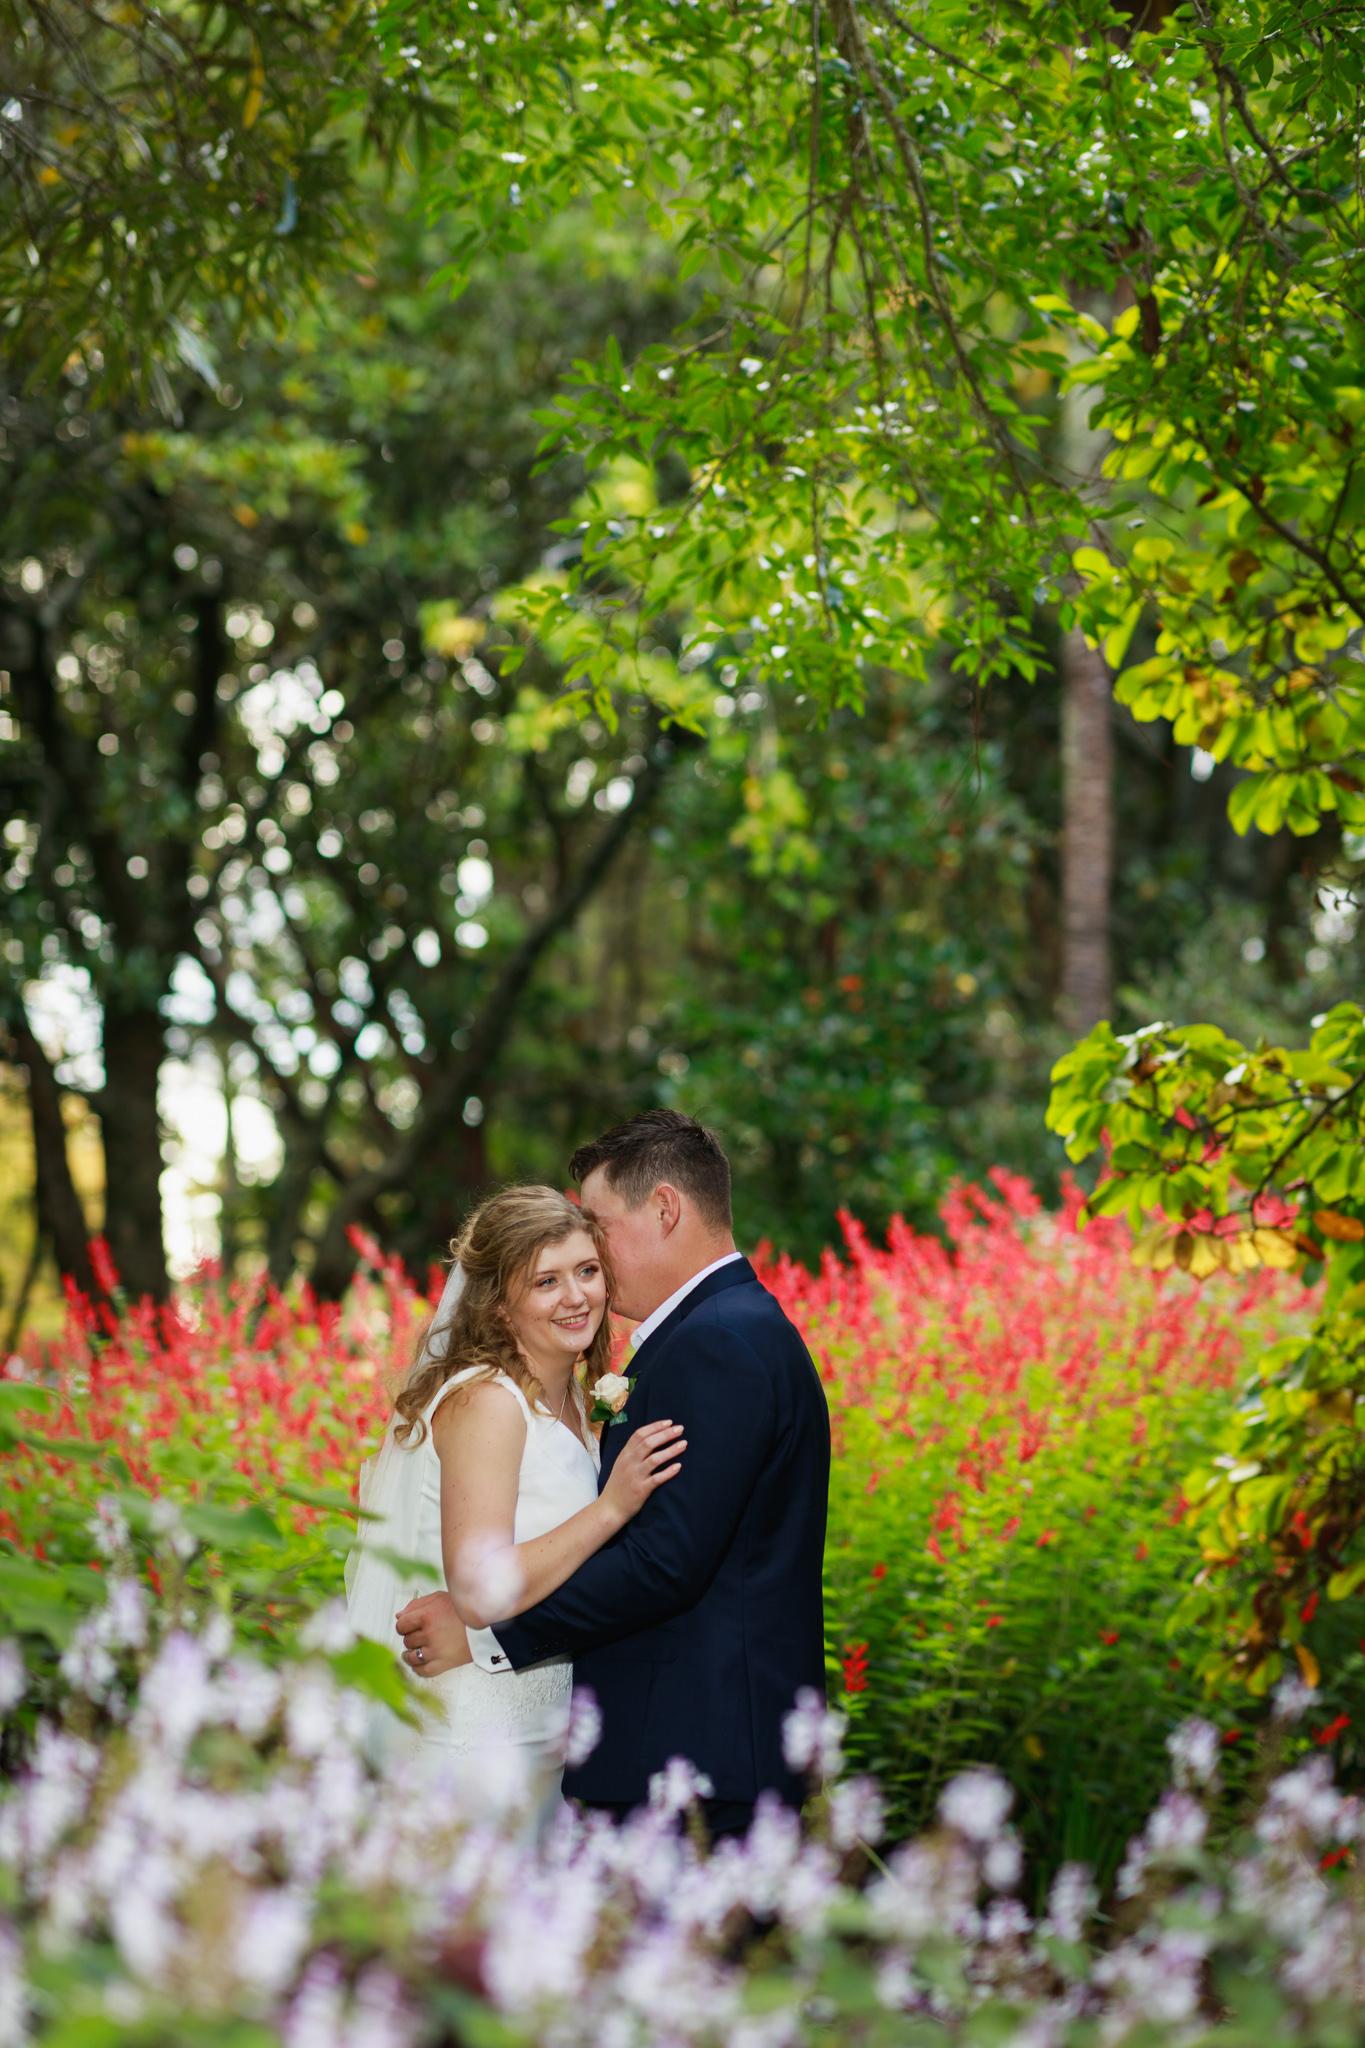 Jess_Harrison_Wedding_web-326.jpgpalmerston-north-wedding-photography-caccia-birch-highlight-new-zealand